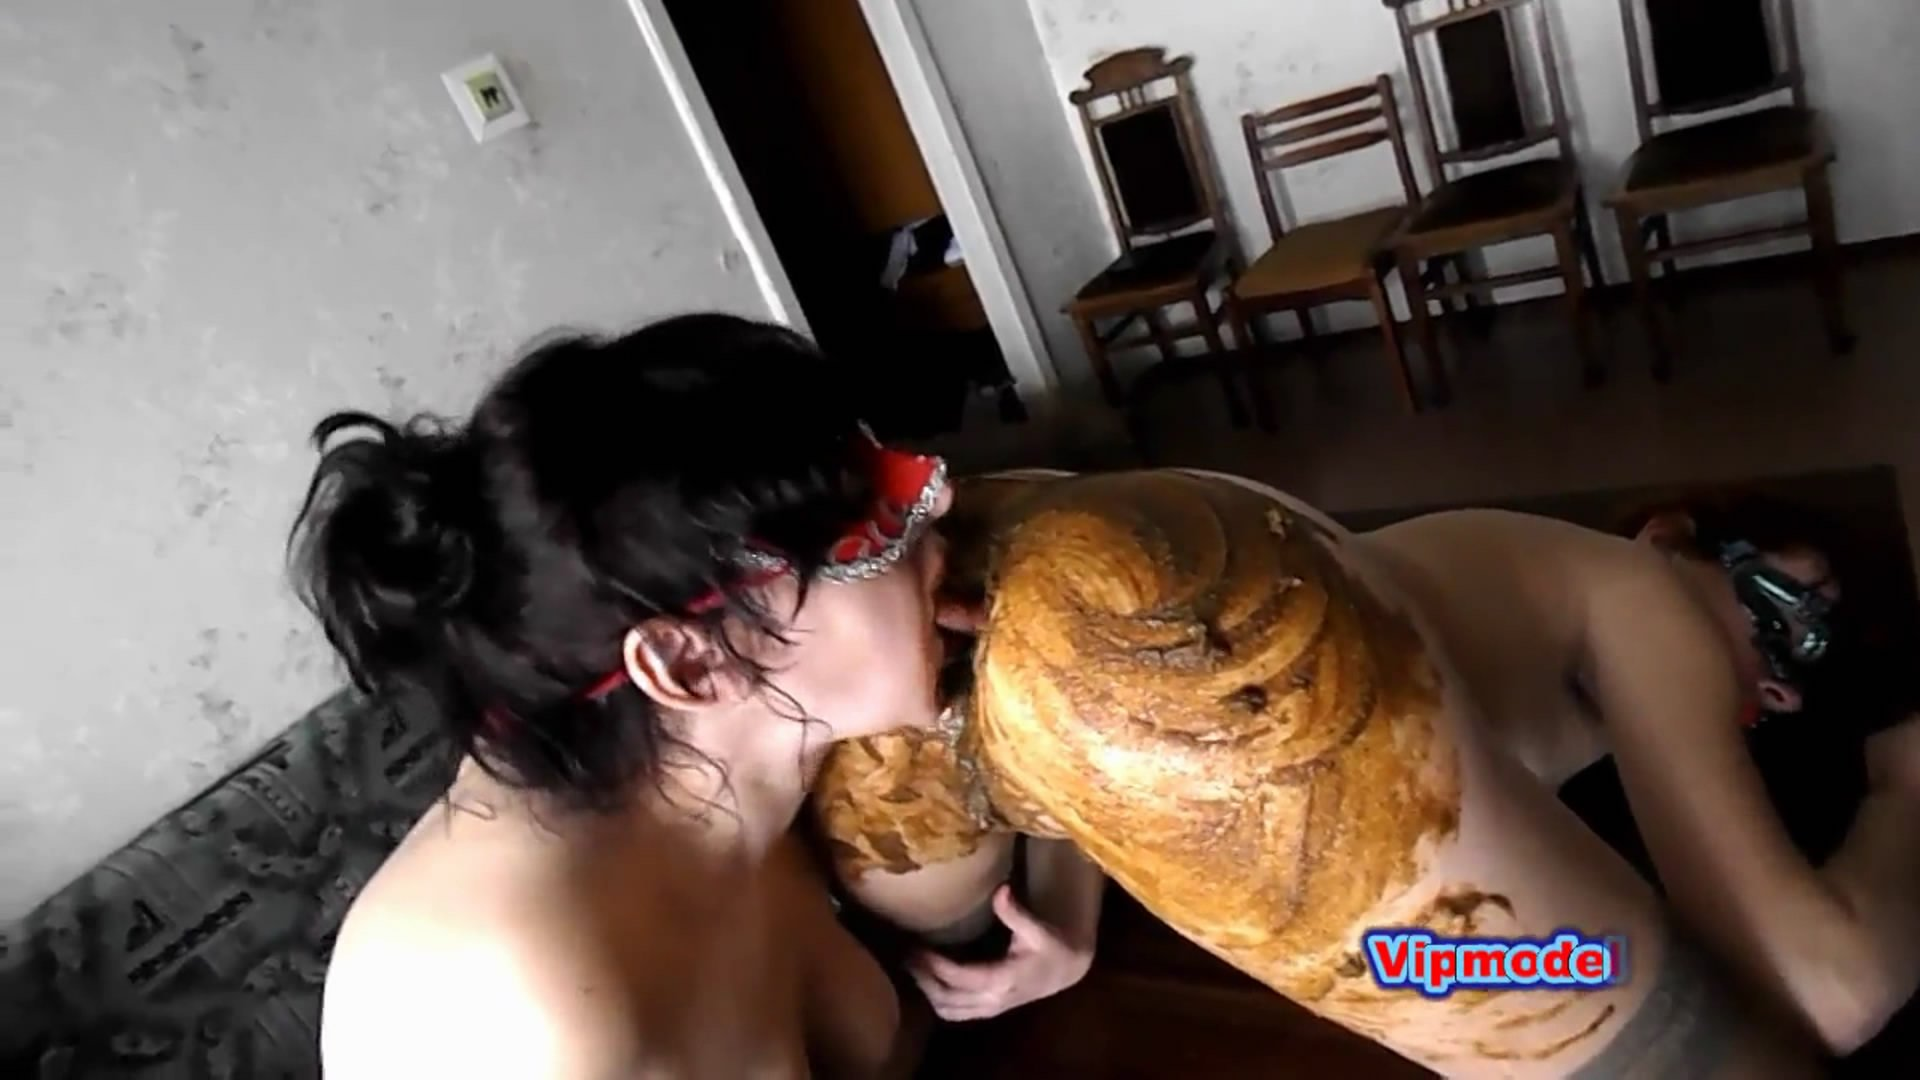 Rimming kv lizhem in mouth, ass part 1 starring in video VipmodelNata